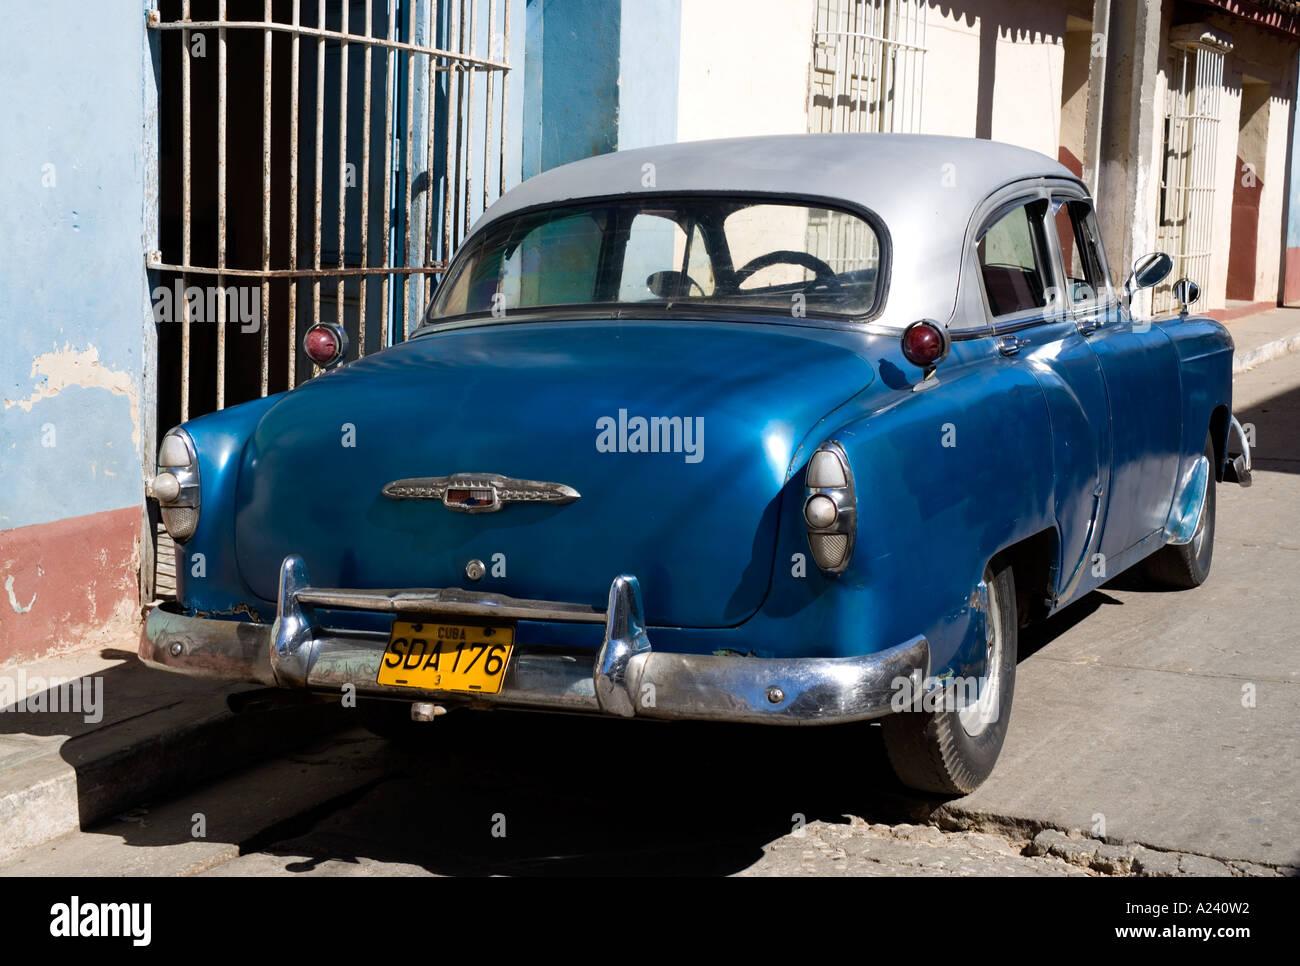 Old Chevrolet car in Trinidad Cuba Stock Photo, Royalty Free Image ...